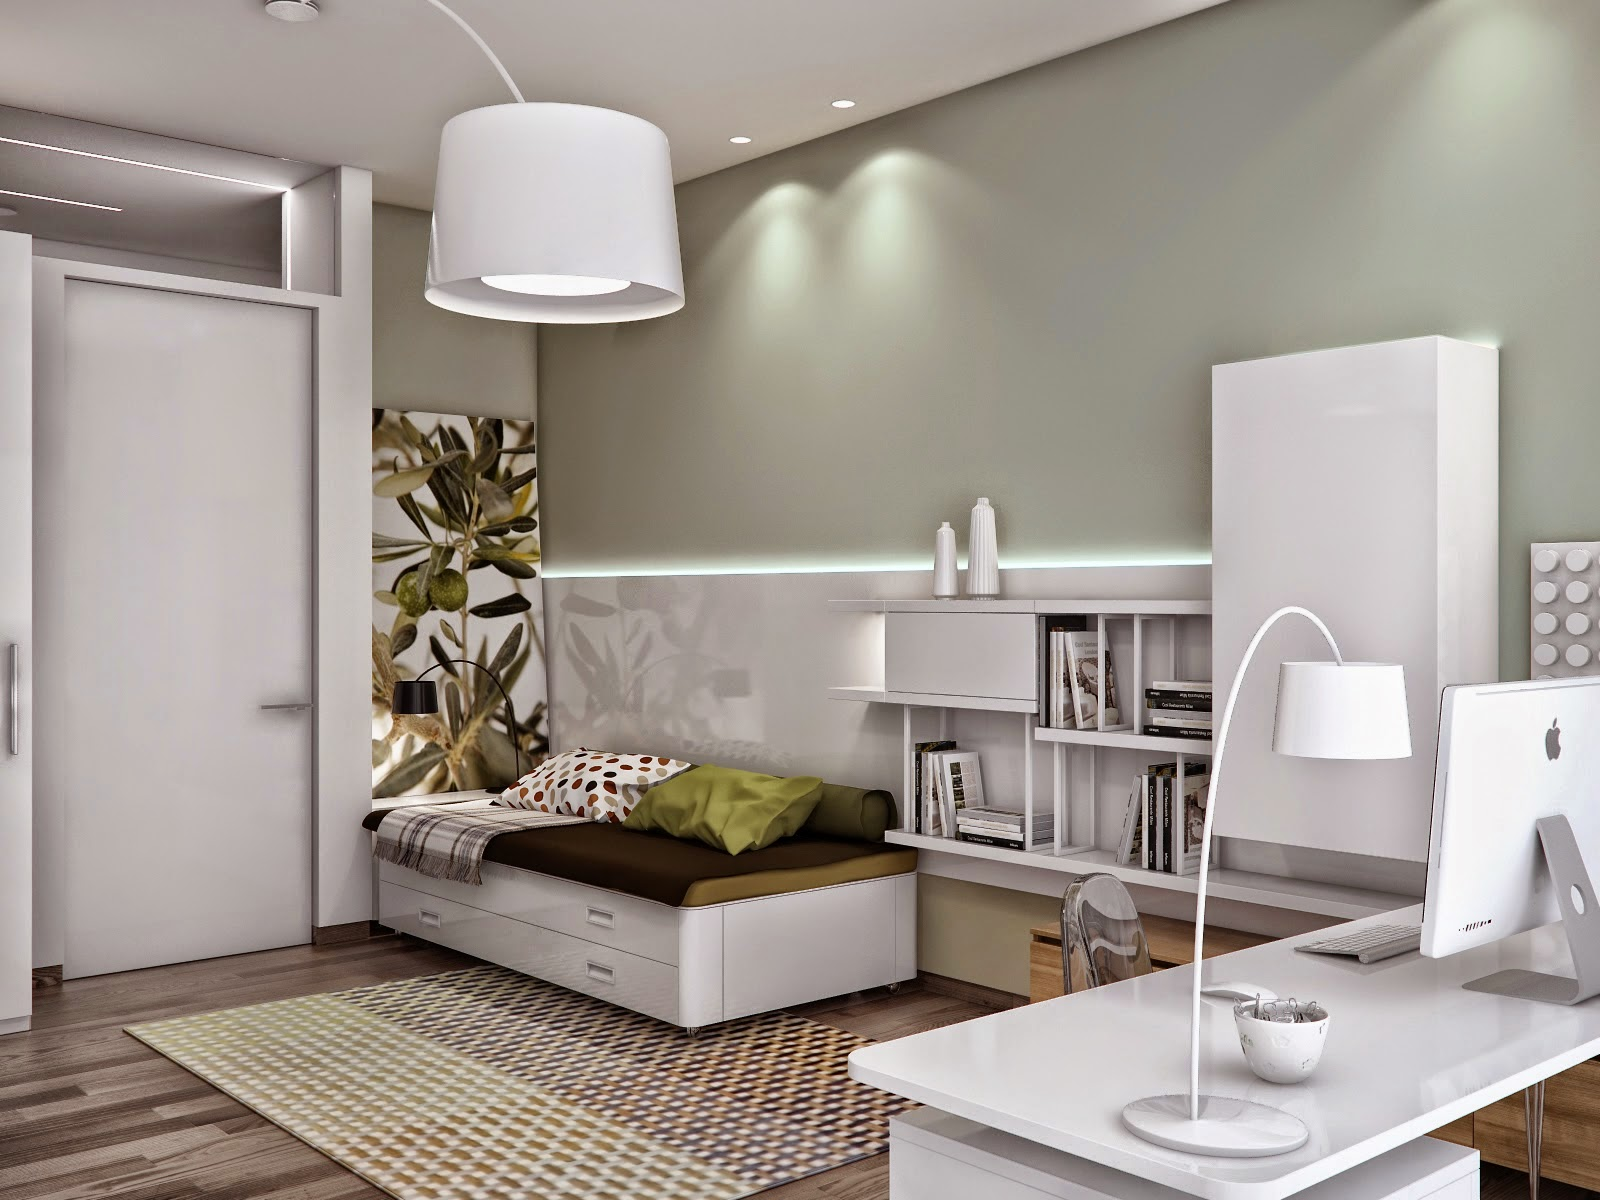 Ini Idea Soho Combine Dengan Bilik Tidur Aku Jenis Yang Moden Style Ringkas Tapi Menarik Color Ruang Nampak Luas Macam Hijau Dan Putih